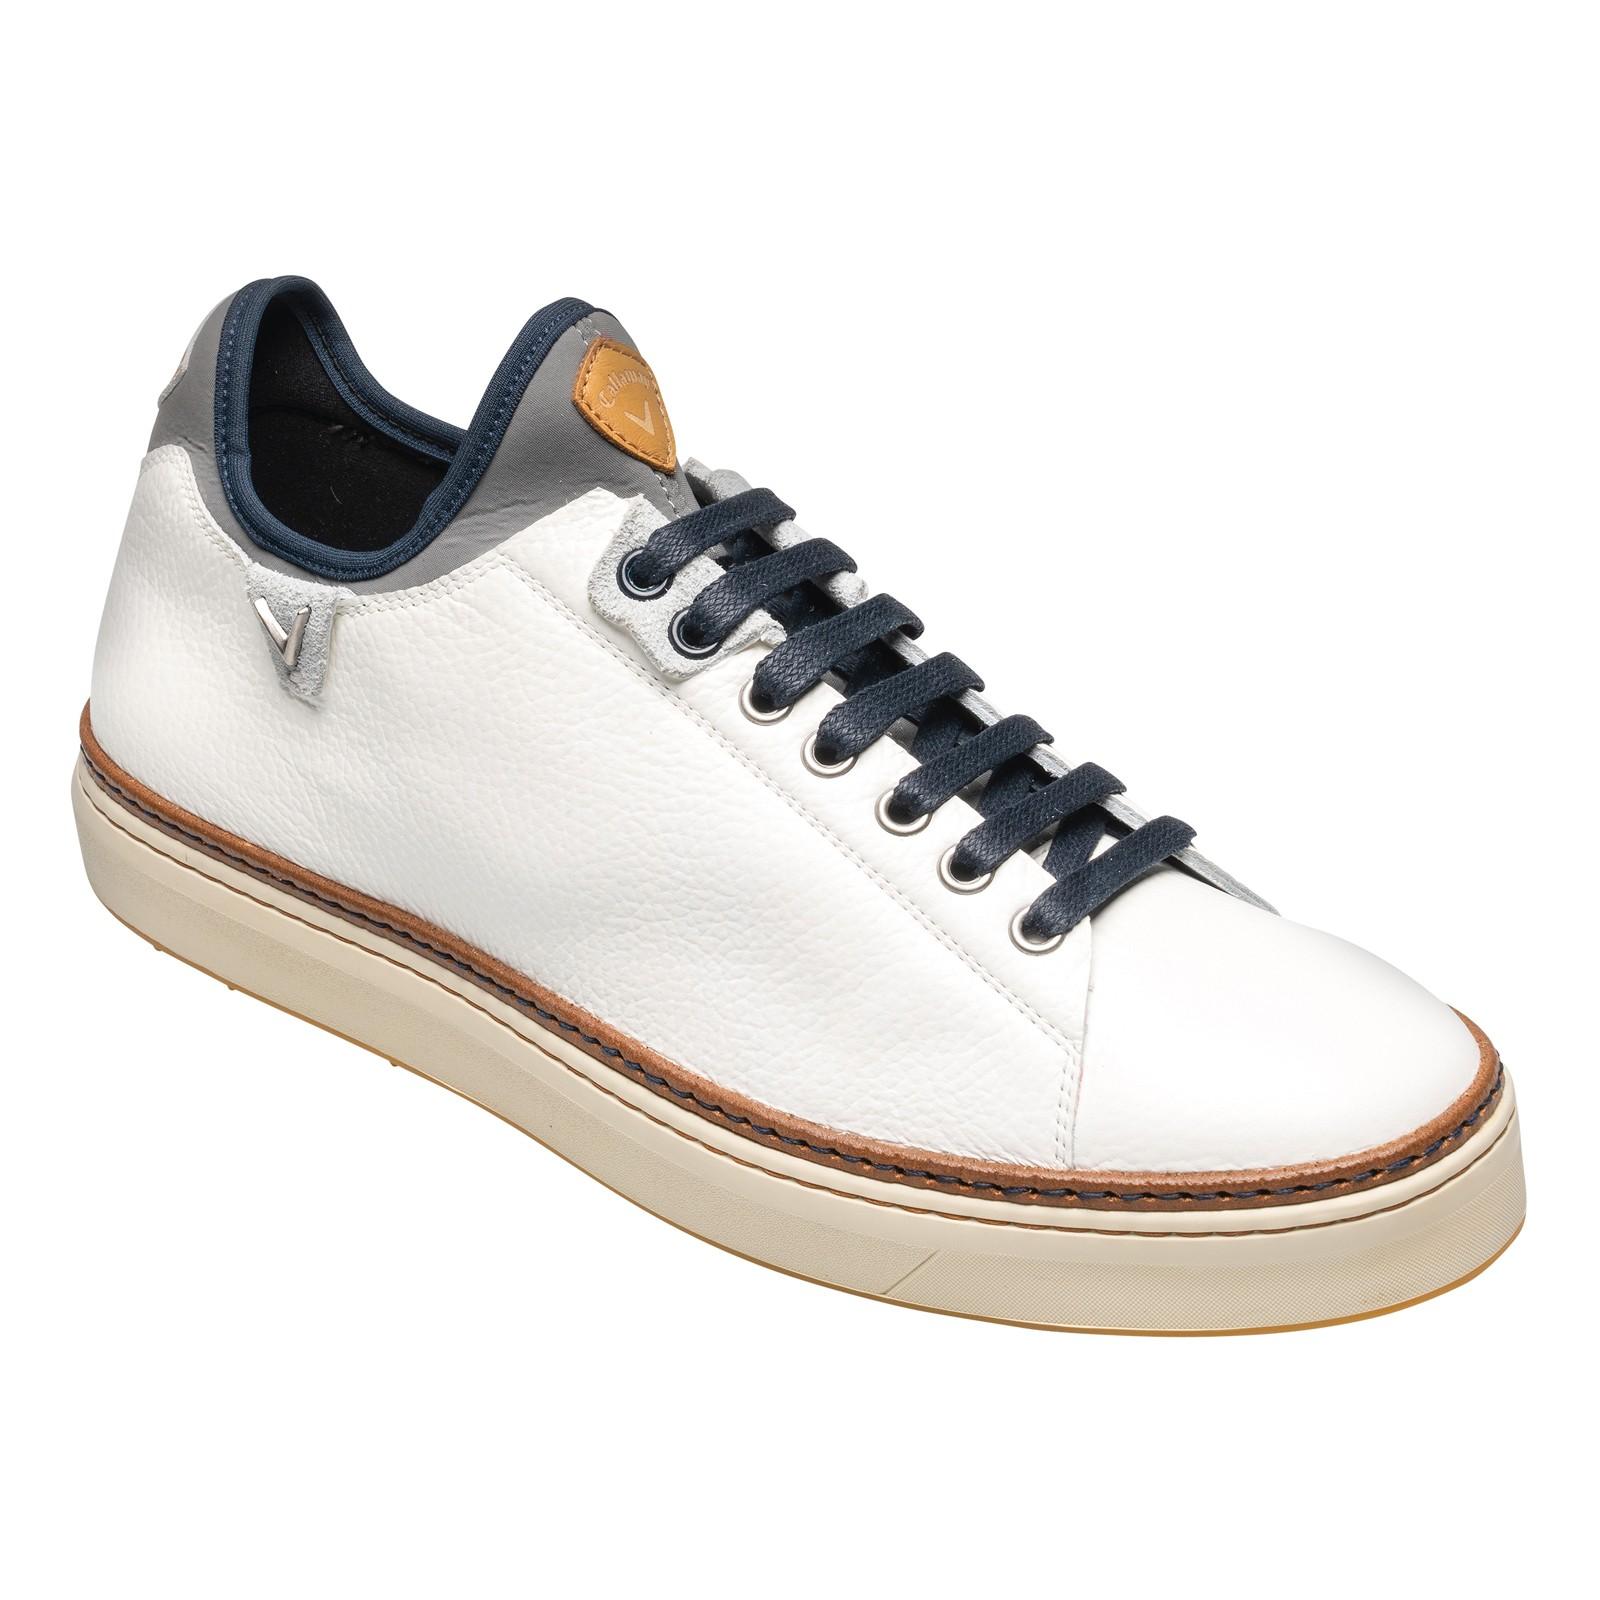 Callaway Casual Golf Shoes